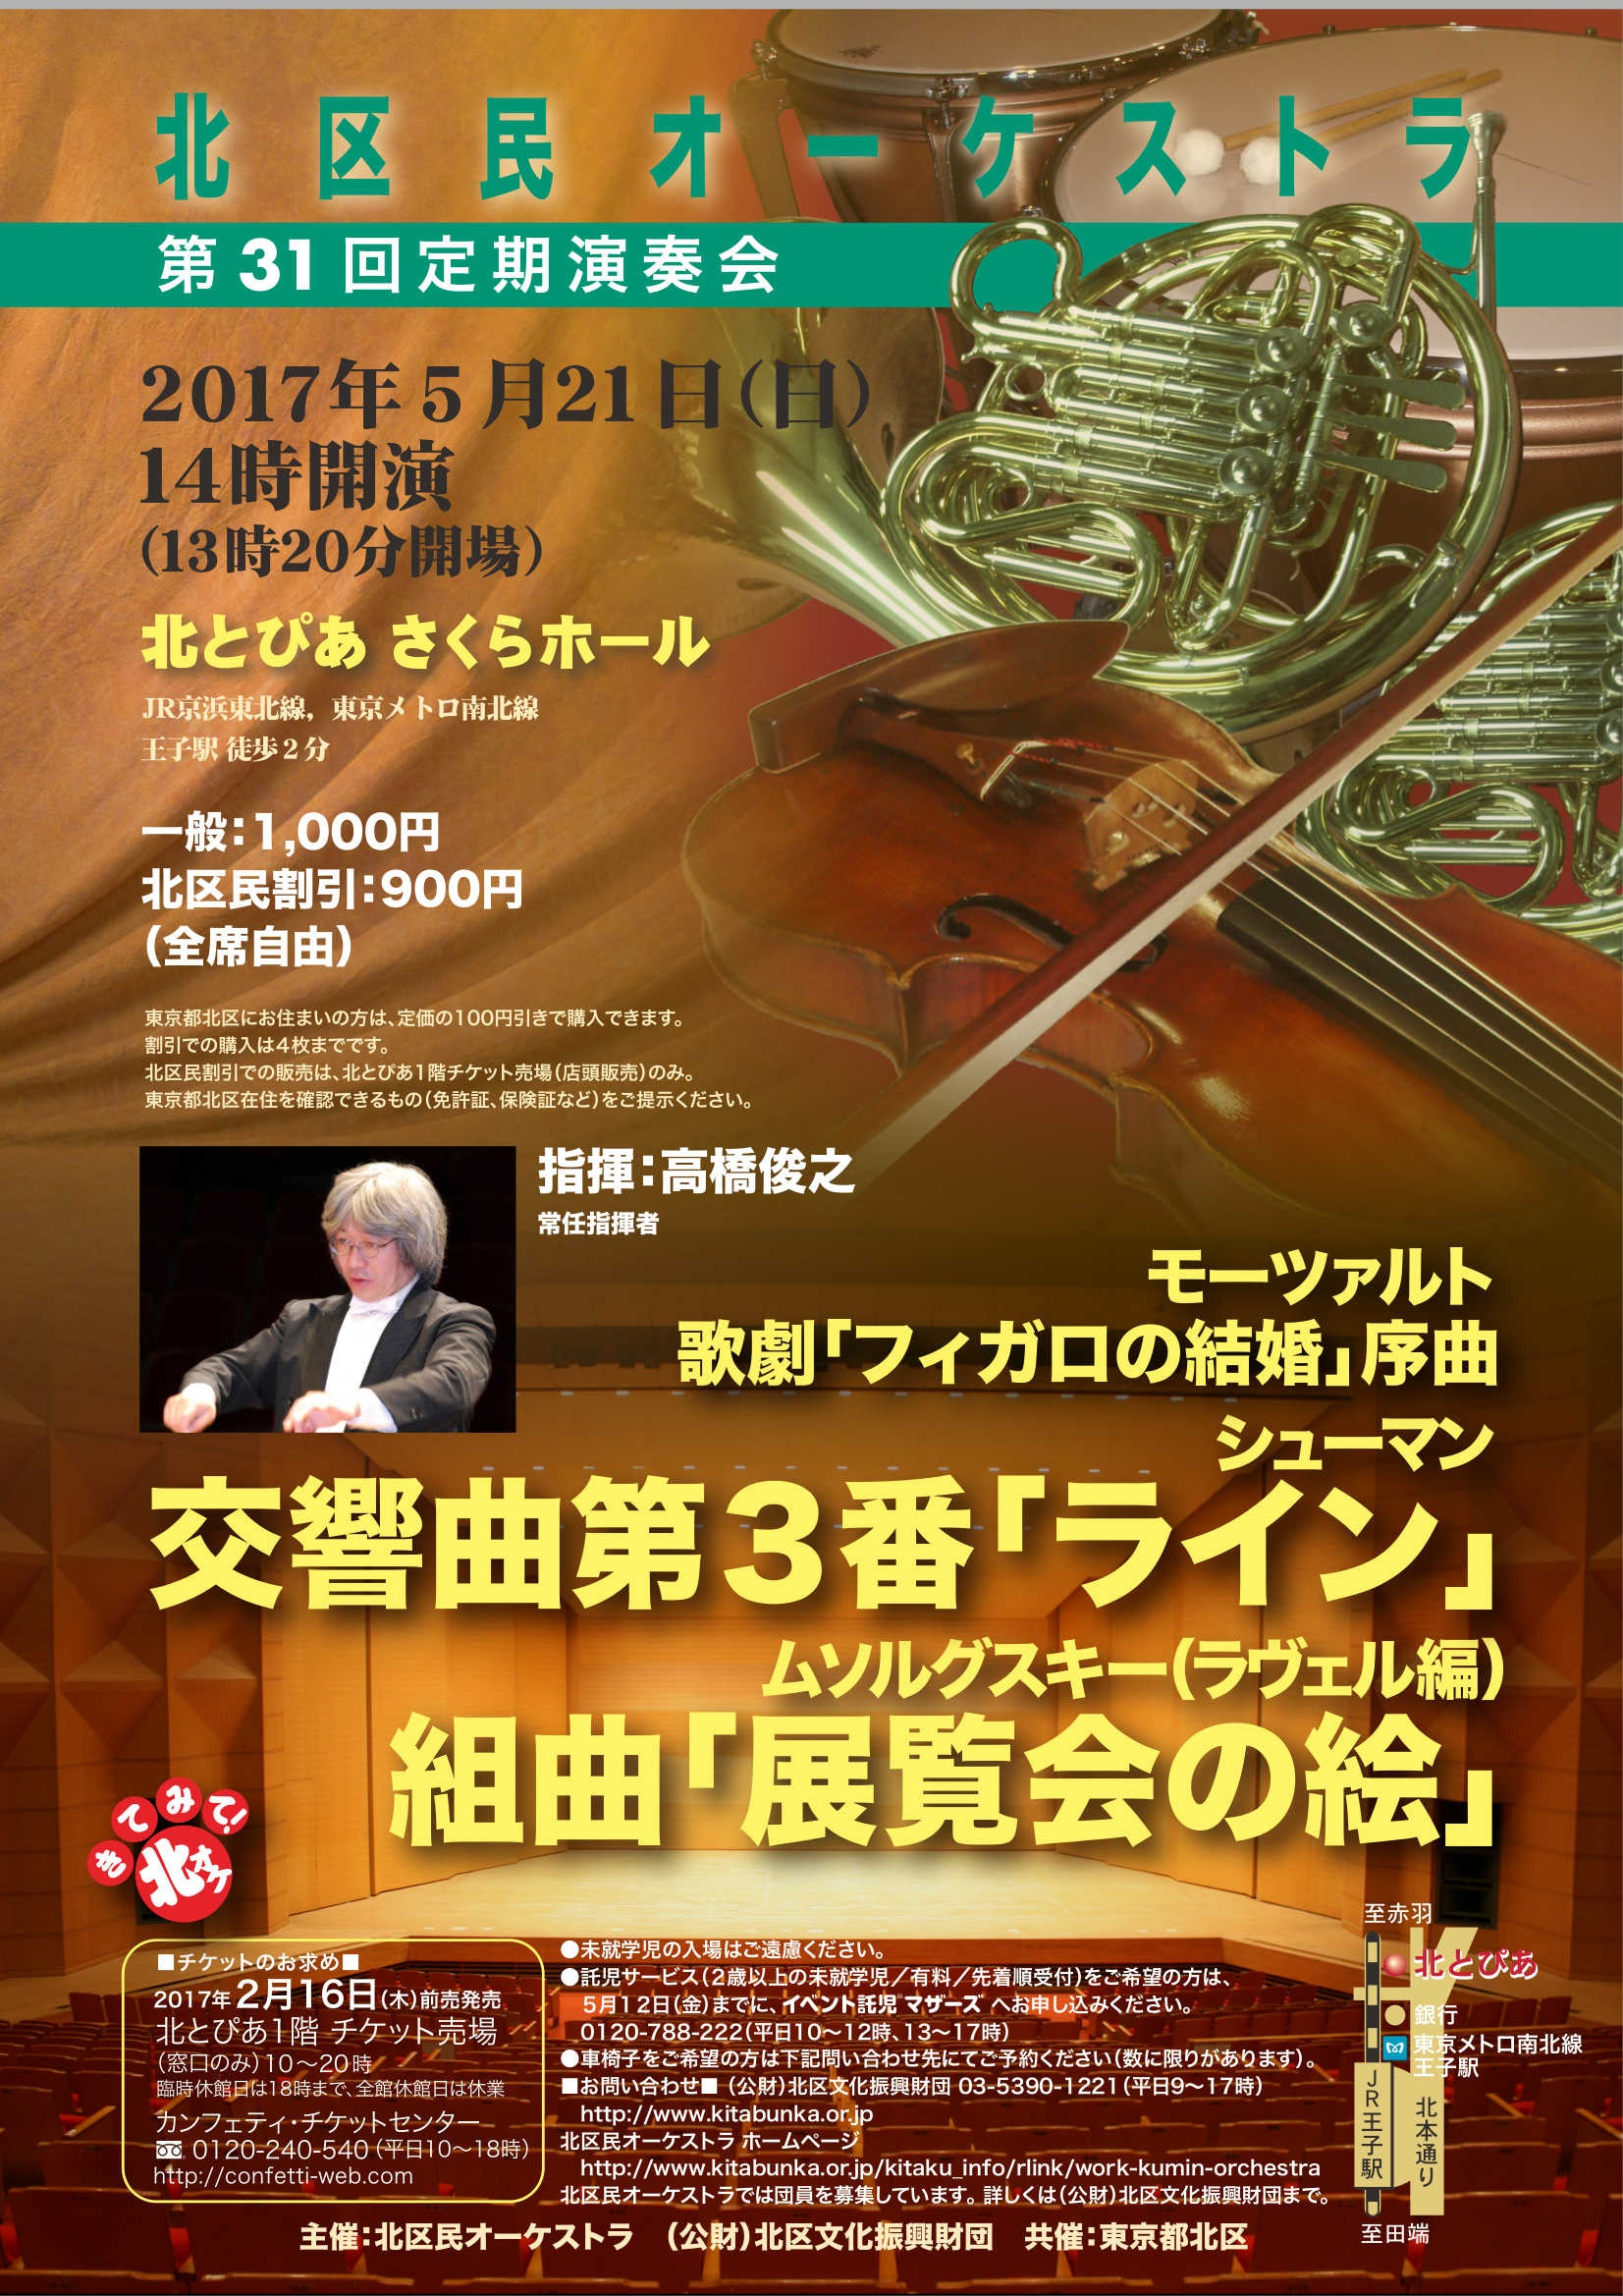 北区民オーケストラ 第31回定期演奏会